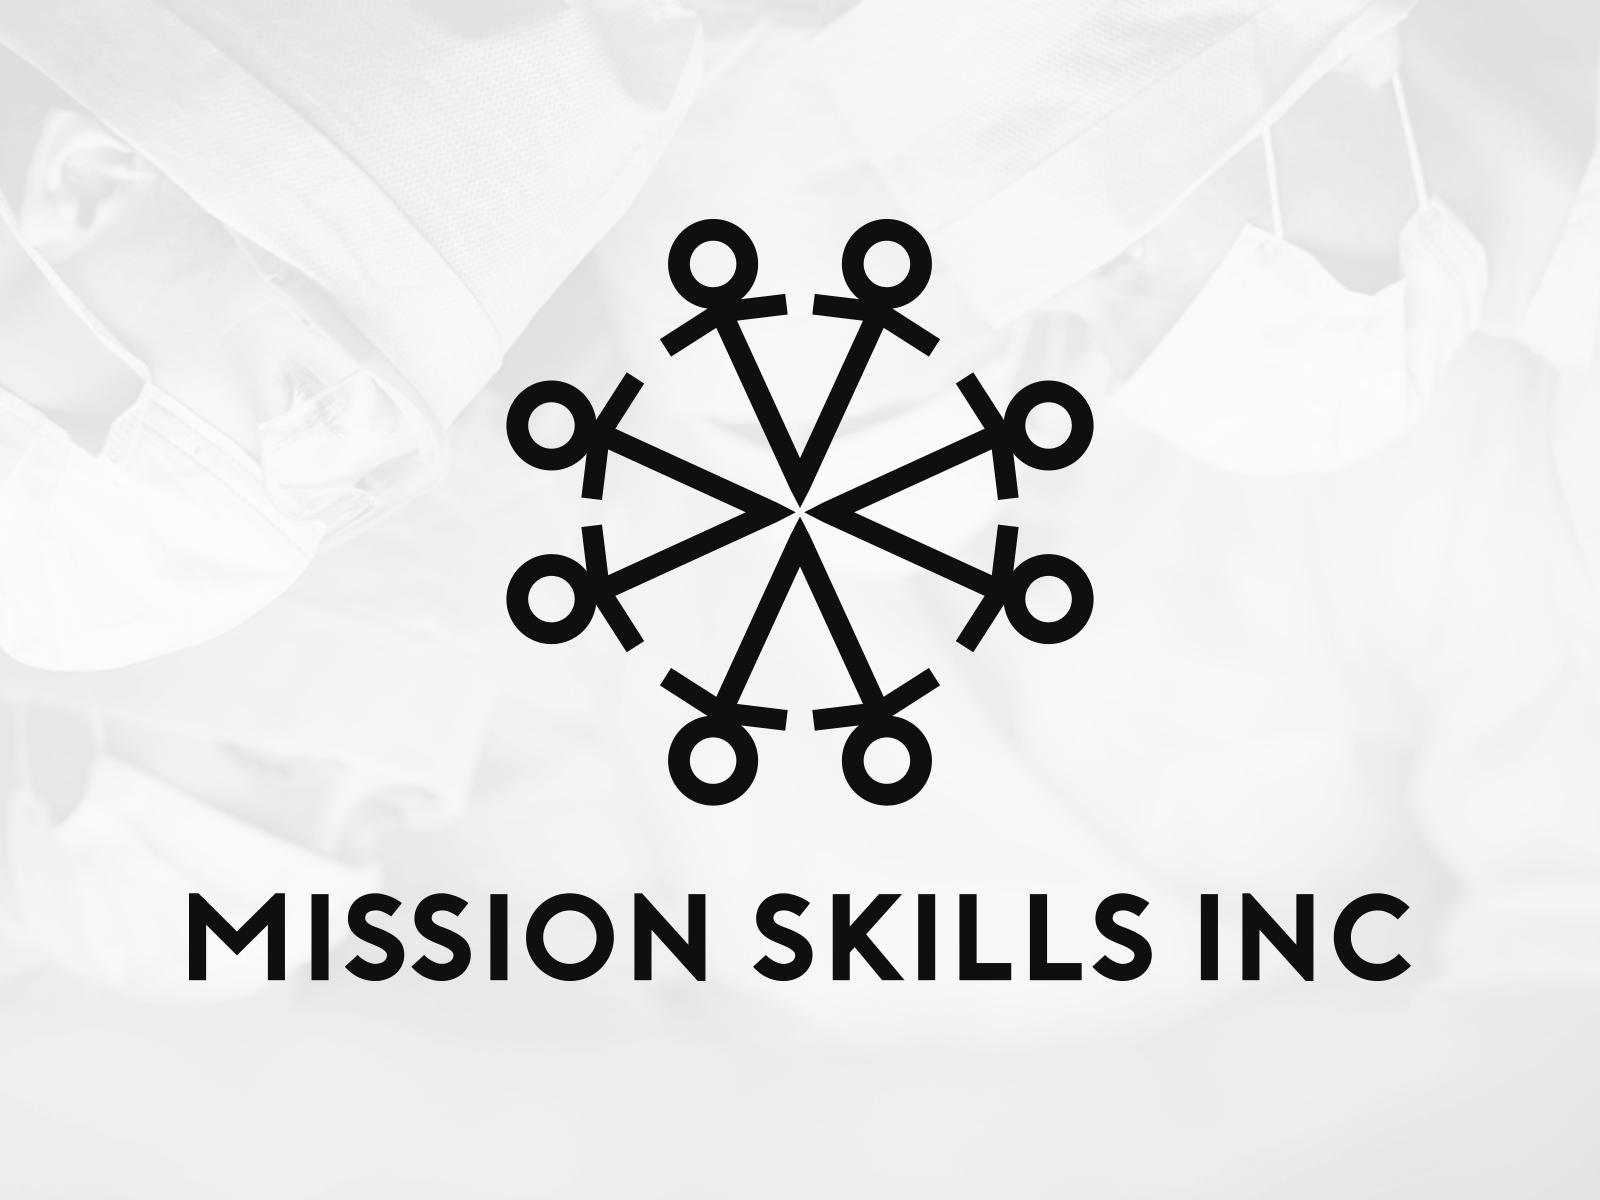 Mission skills logo inc